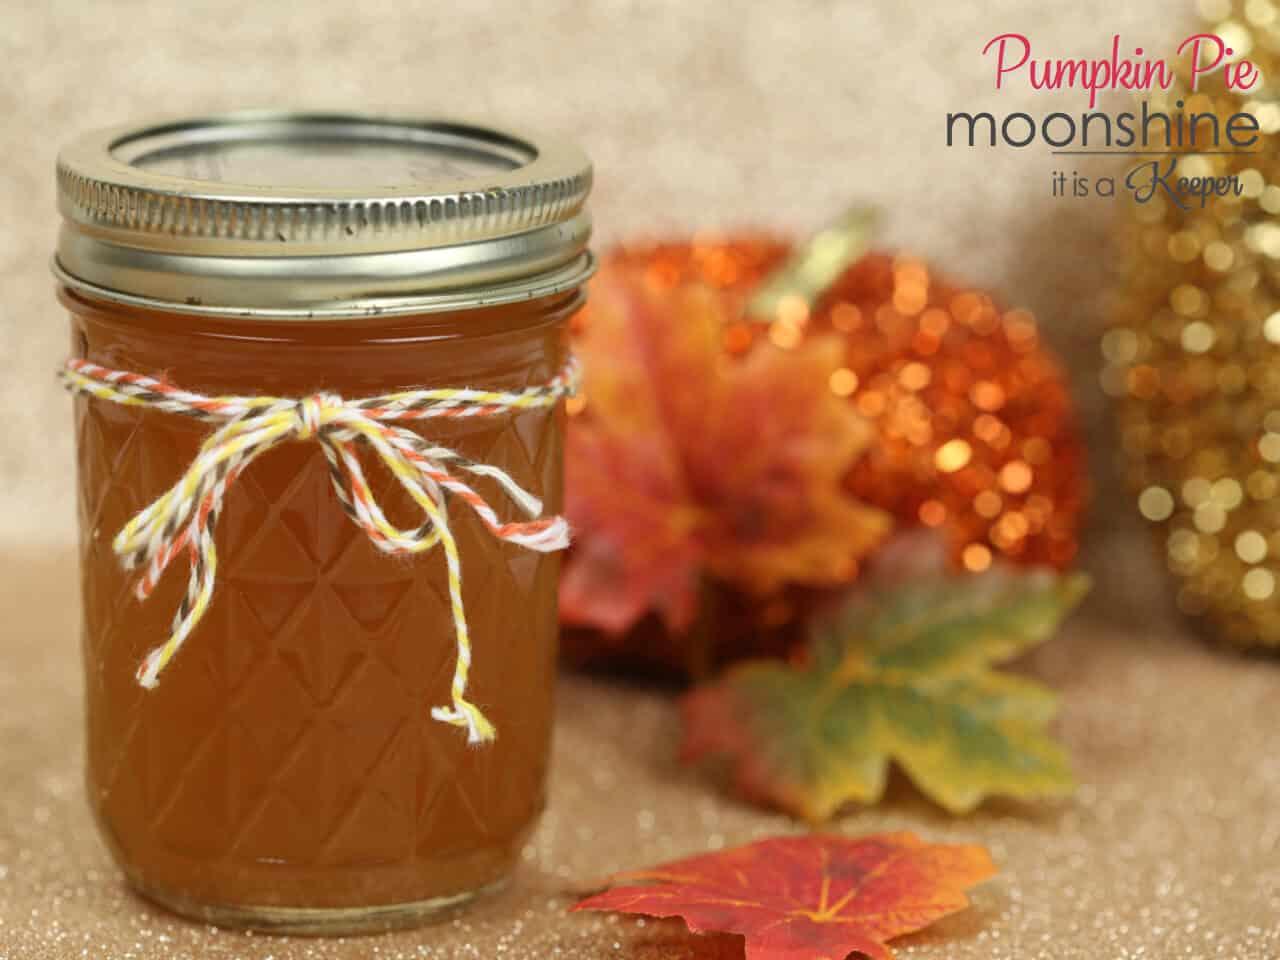 Pumpkin pie moonshine